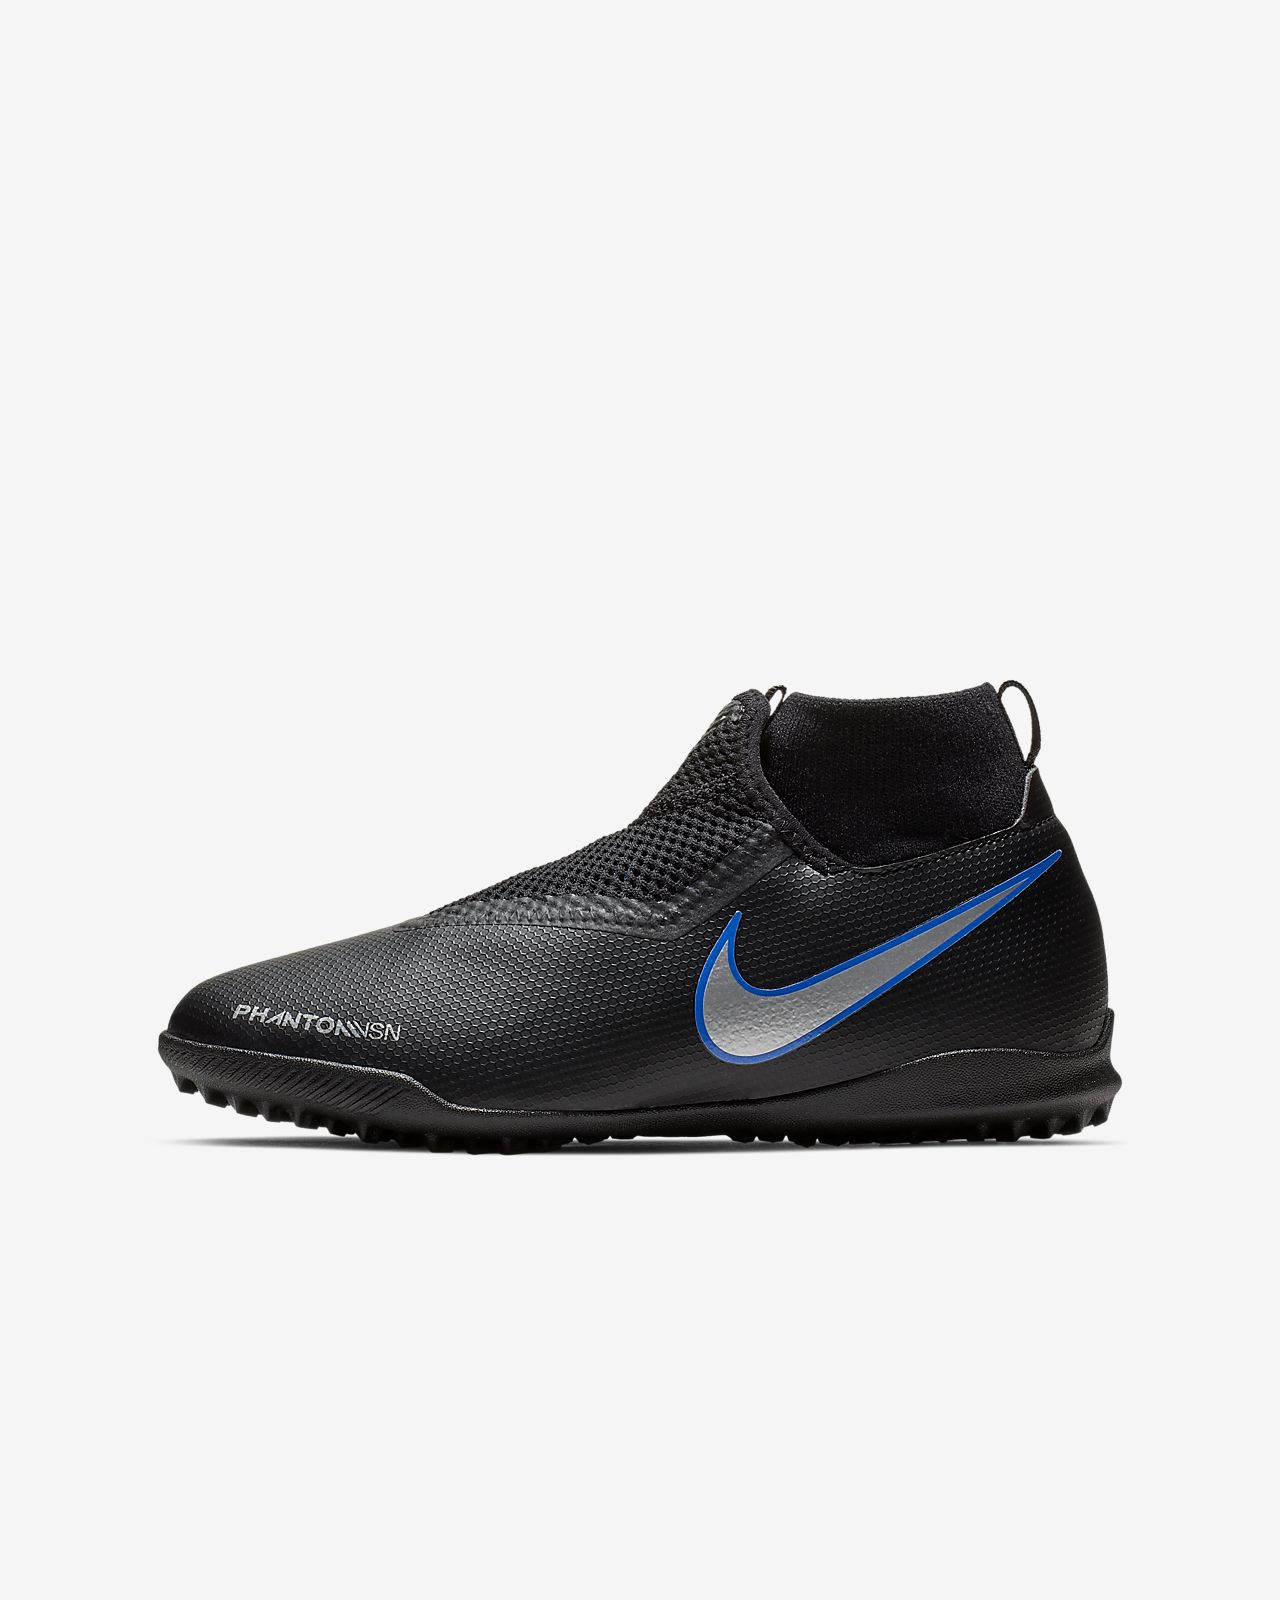 size 40 12d5b 7806c ... Nike Jr. Phantom Vision Academy Dynamic Fit Botas de fútbol para  moqueta - Turf -